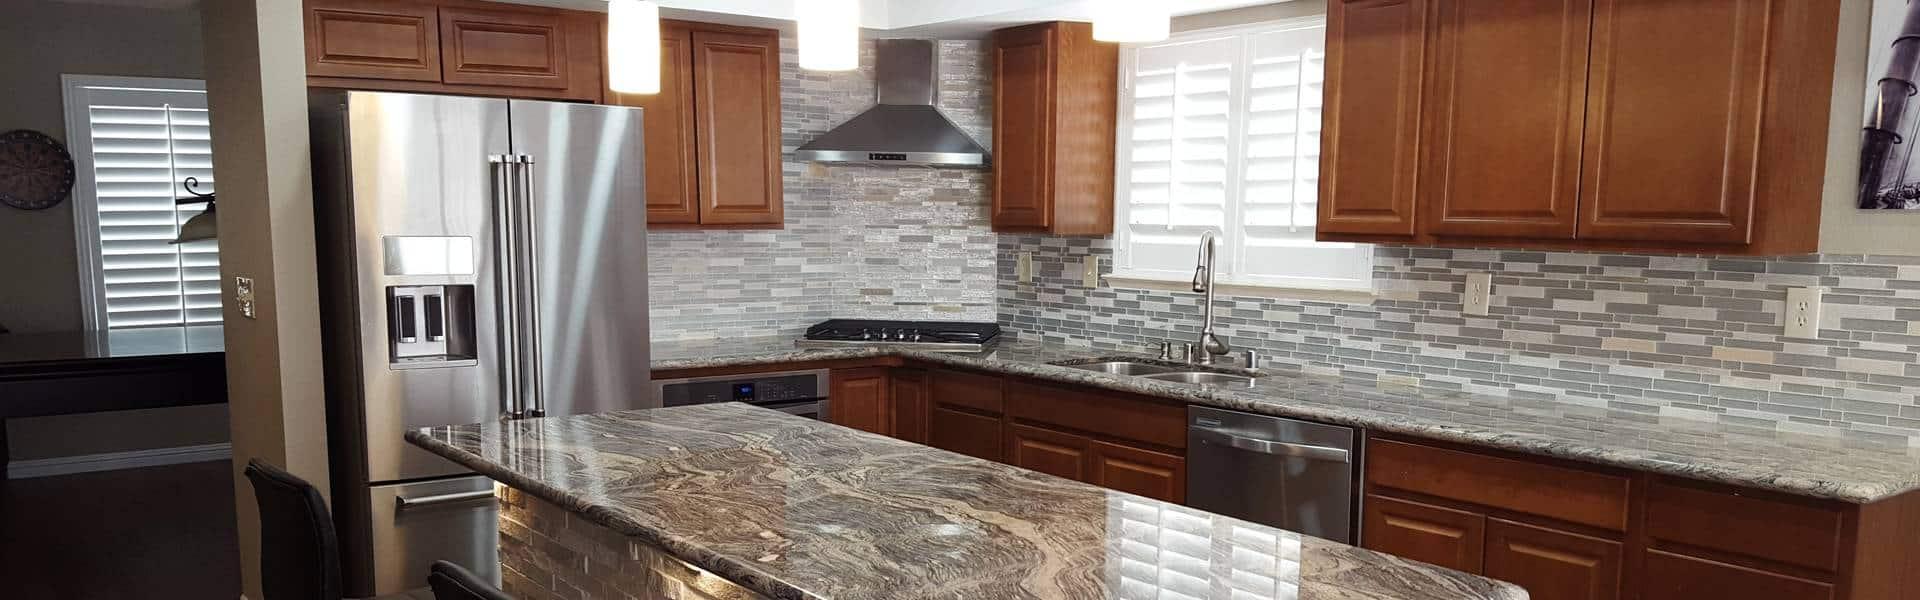 giclv kitchen remodel las vegas remodeling home improvement